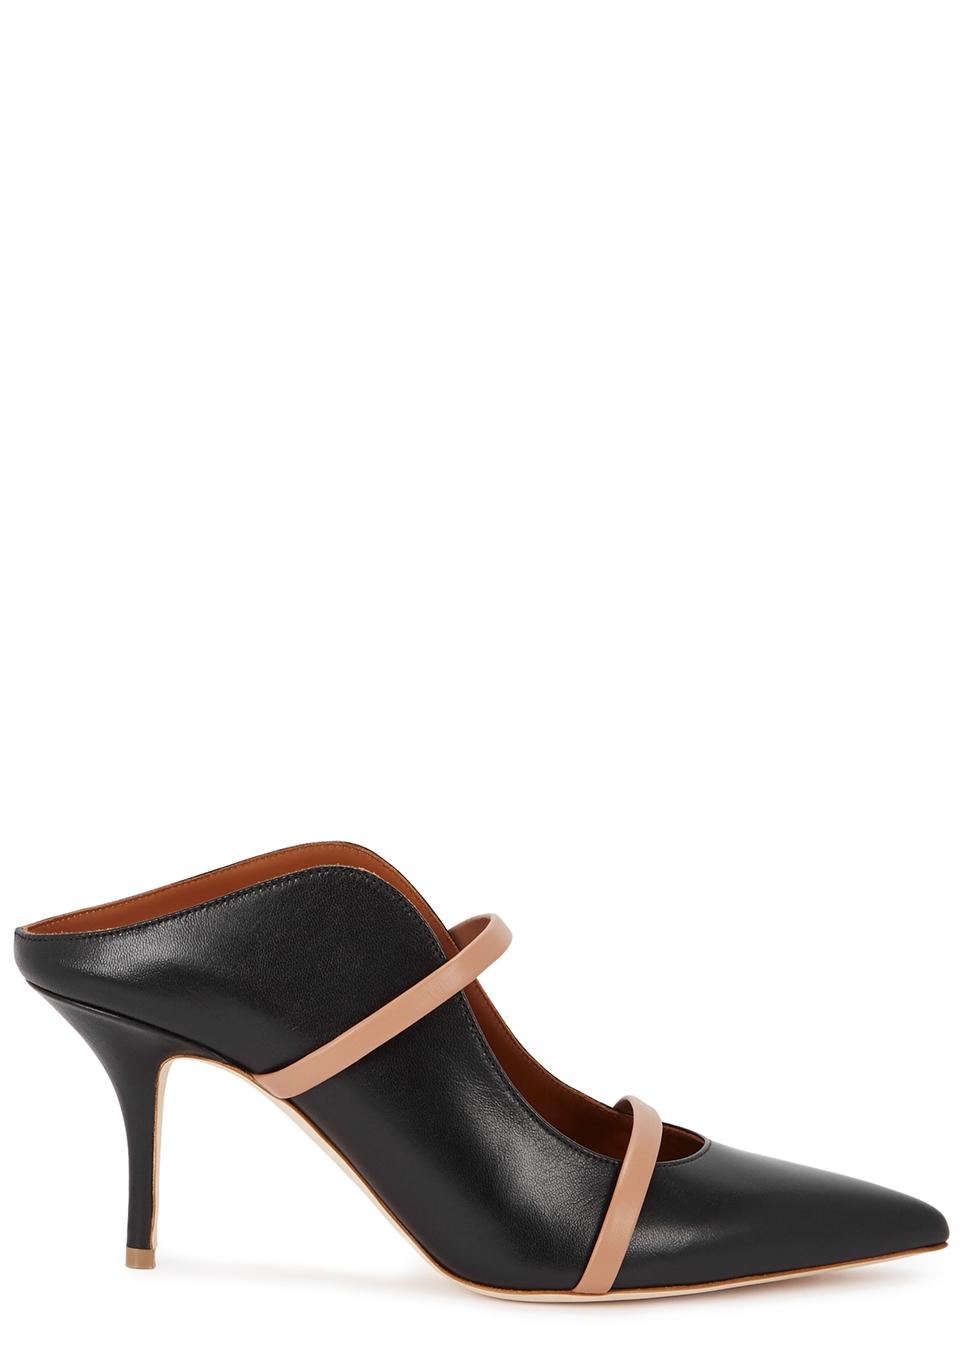 Maureen 70 black leather mules